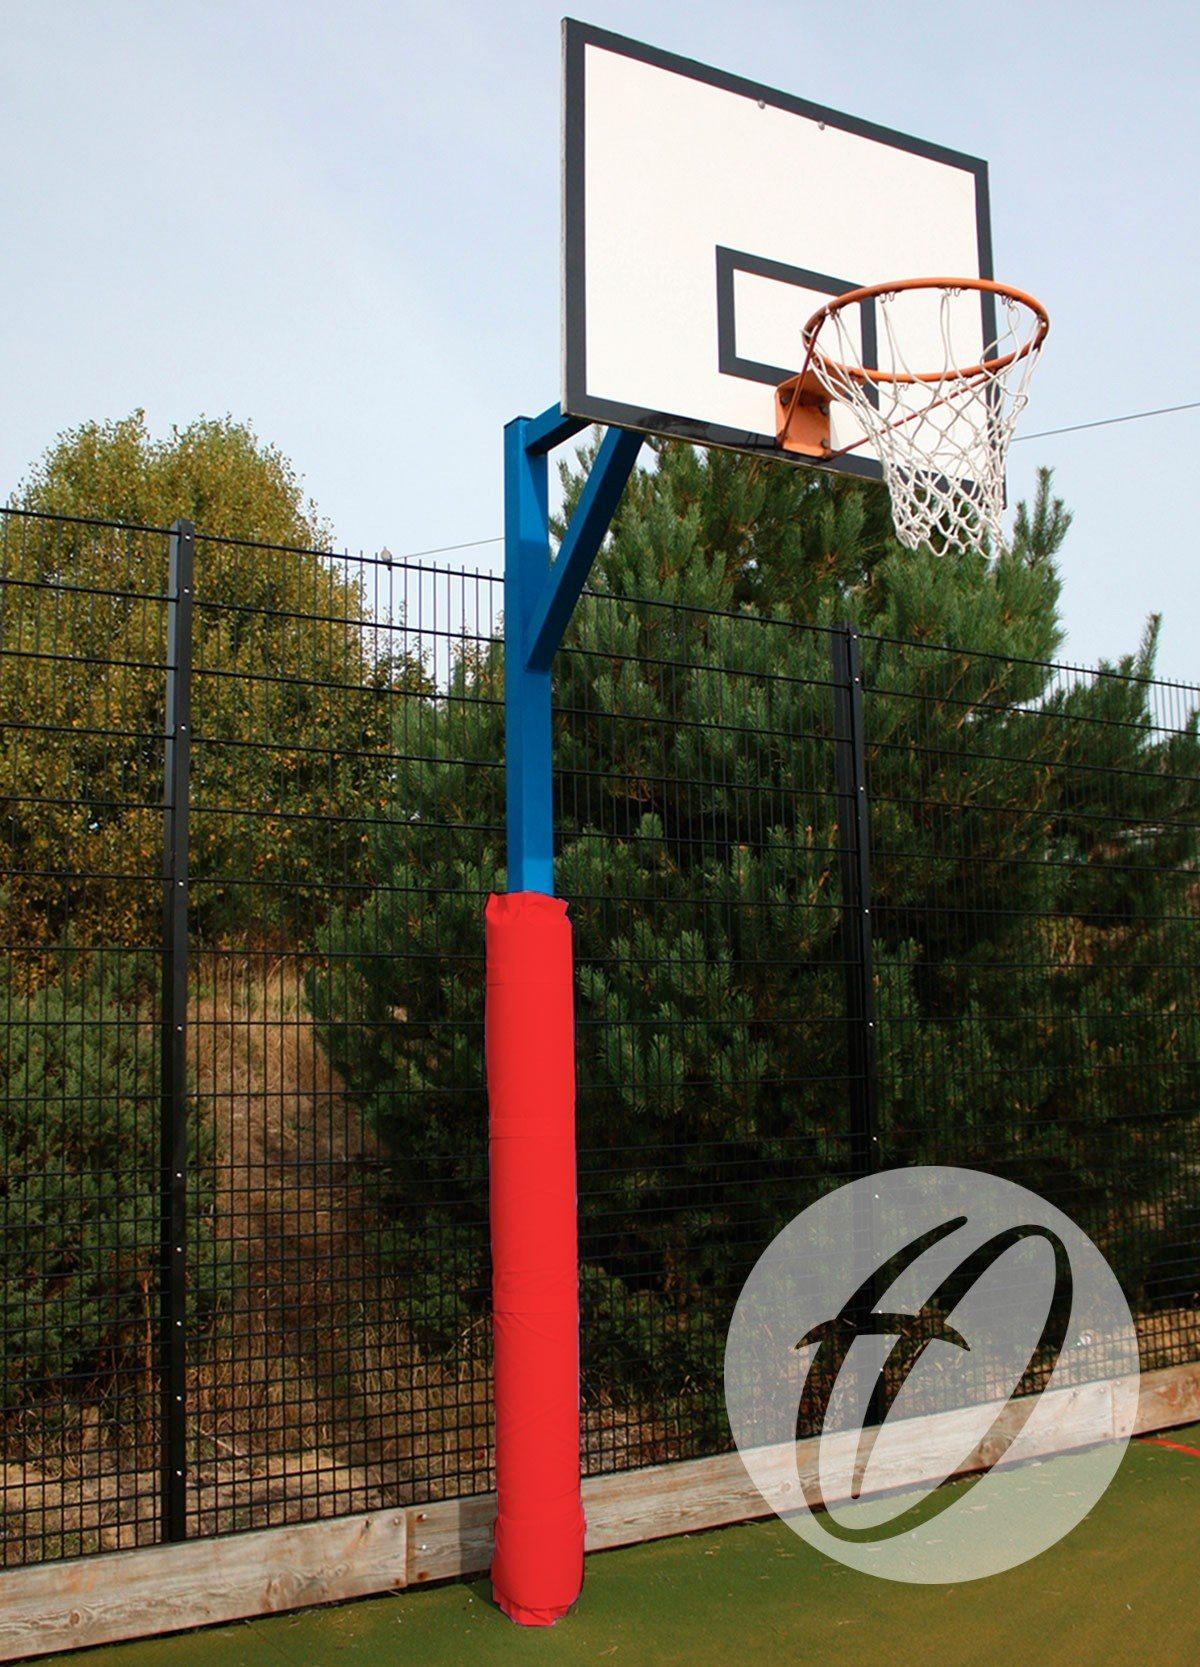 BASKETBALL POST PROTECTORS - SINGLE COLOURED